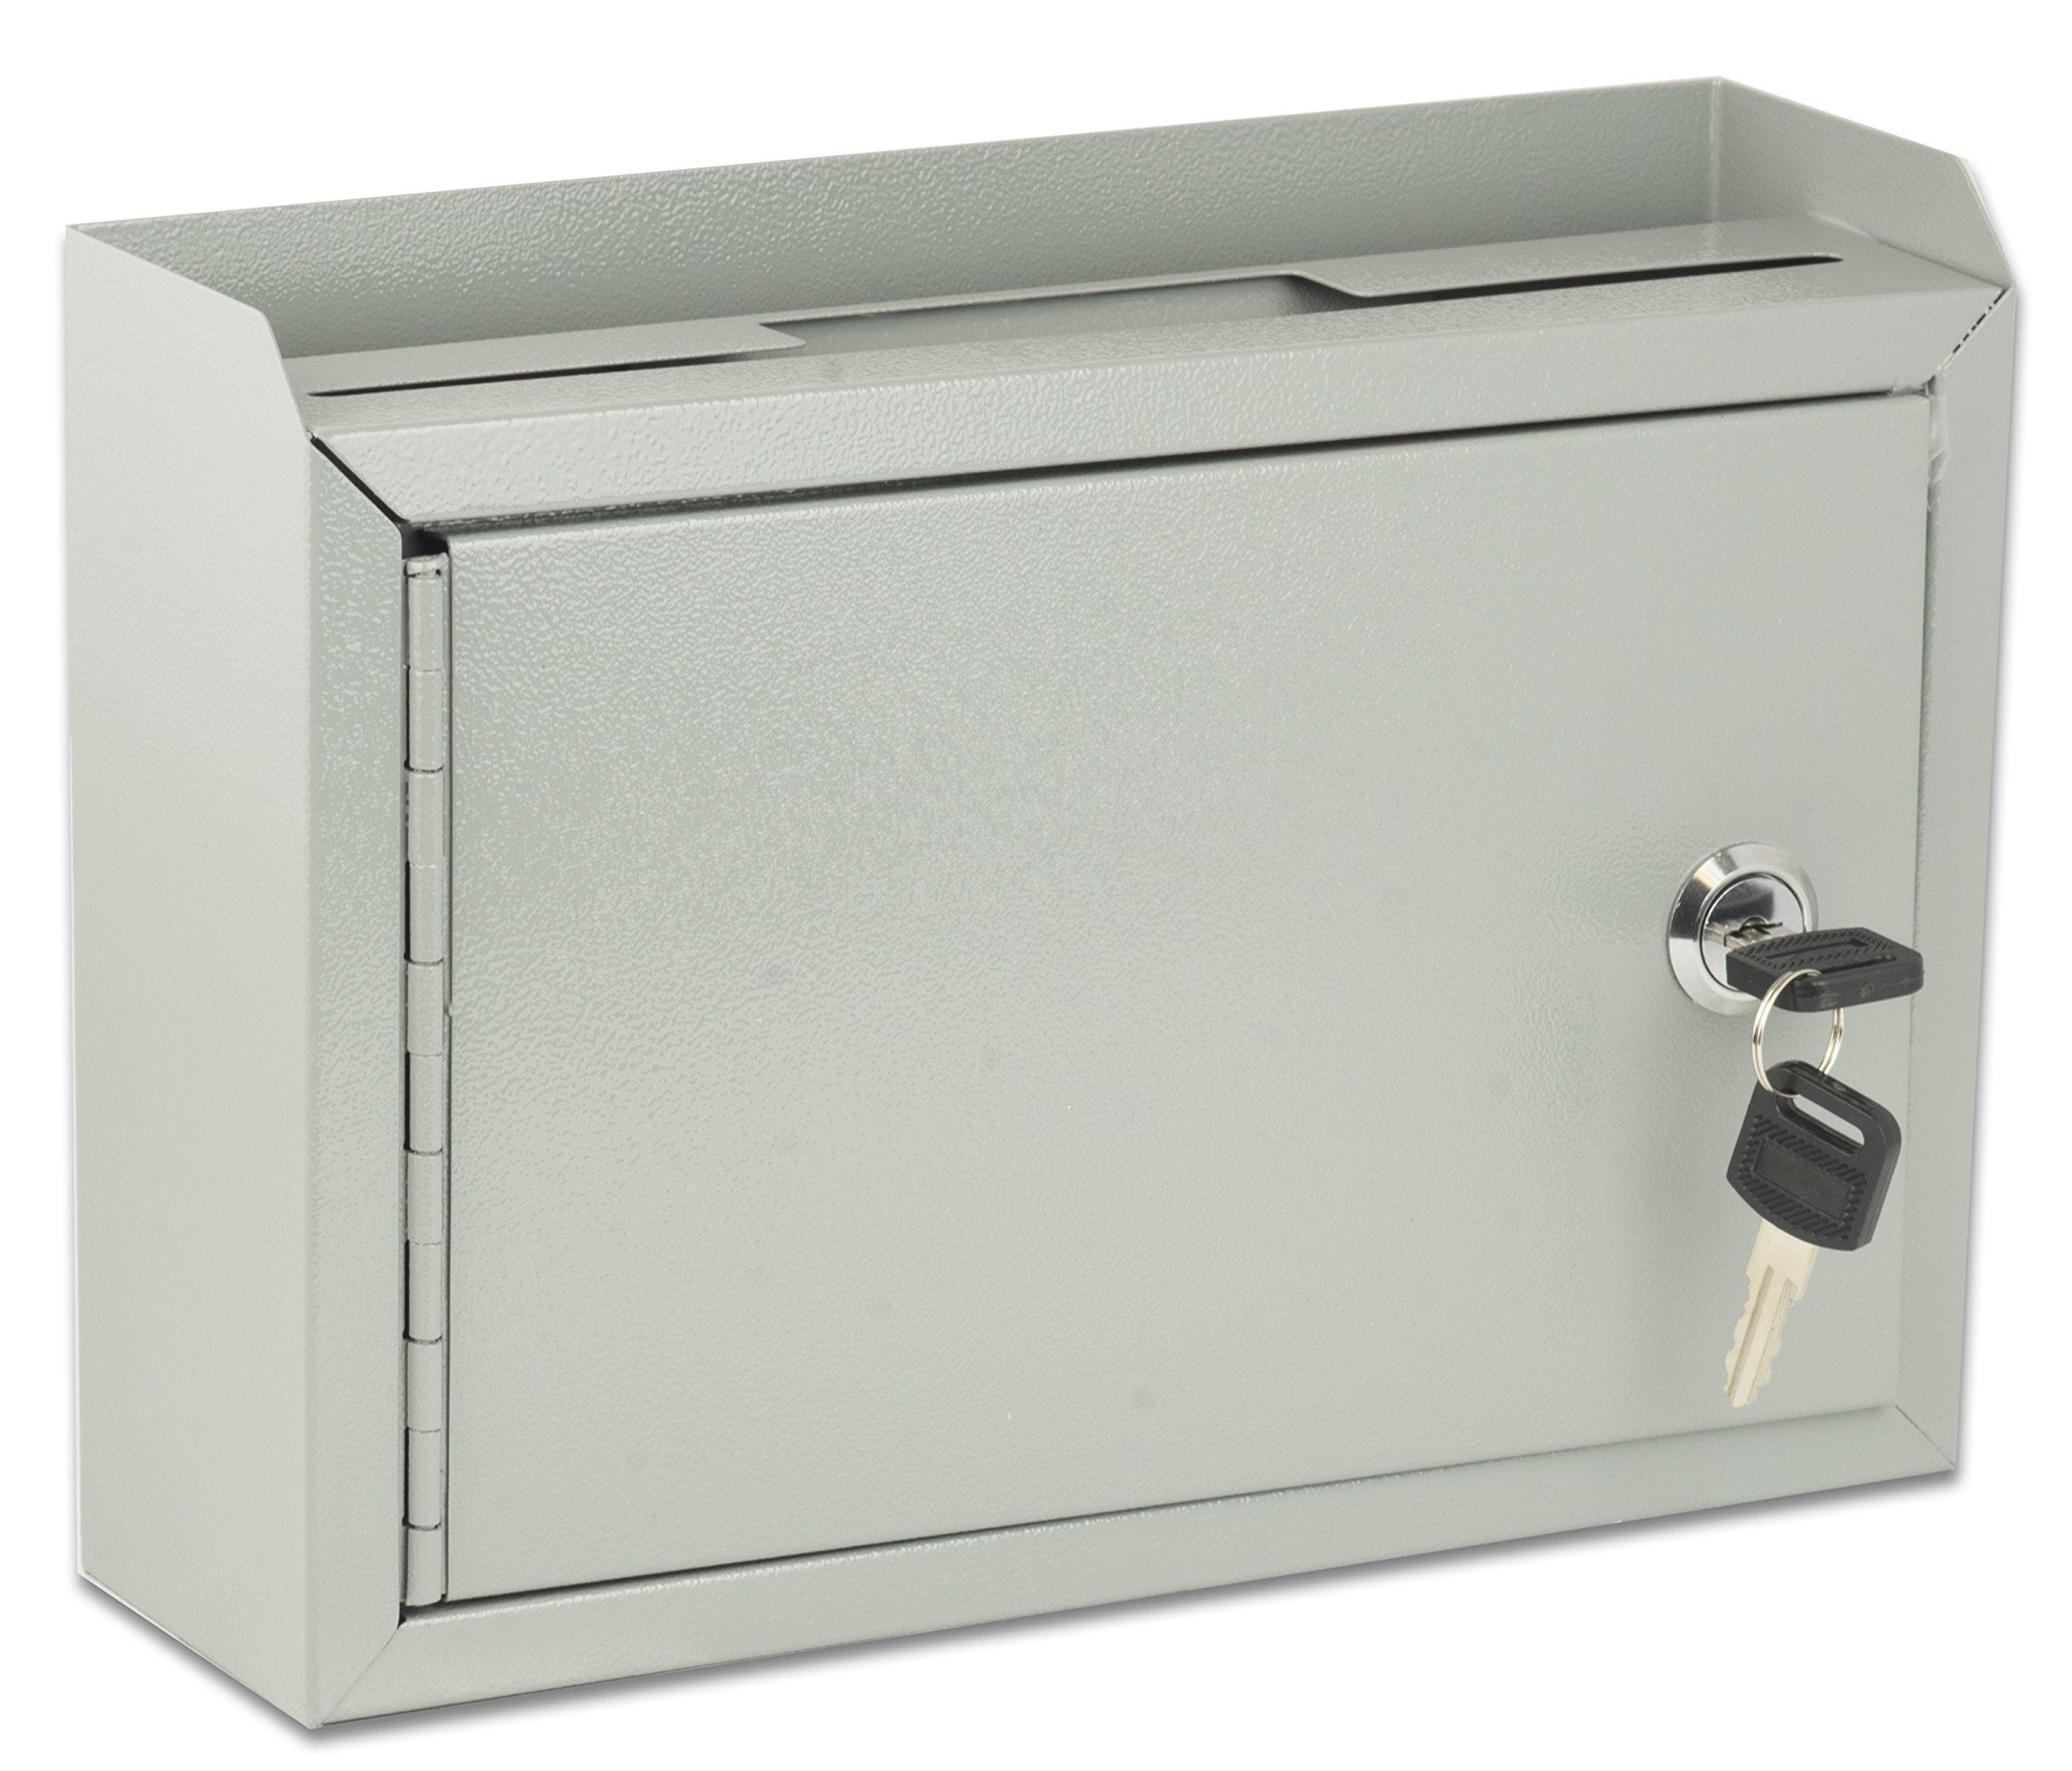 AdirOffice Multi Purpose Wall Mountable Suggestion Box, 9.75'' x 7'' x 3'' by Adir Corp.